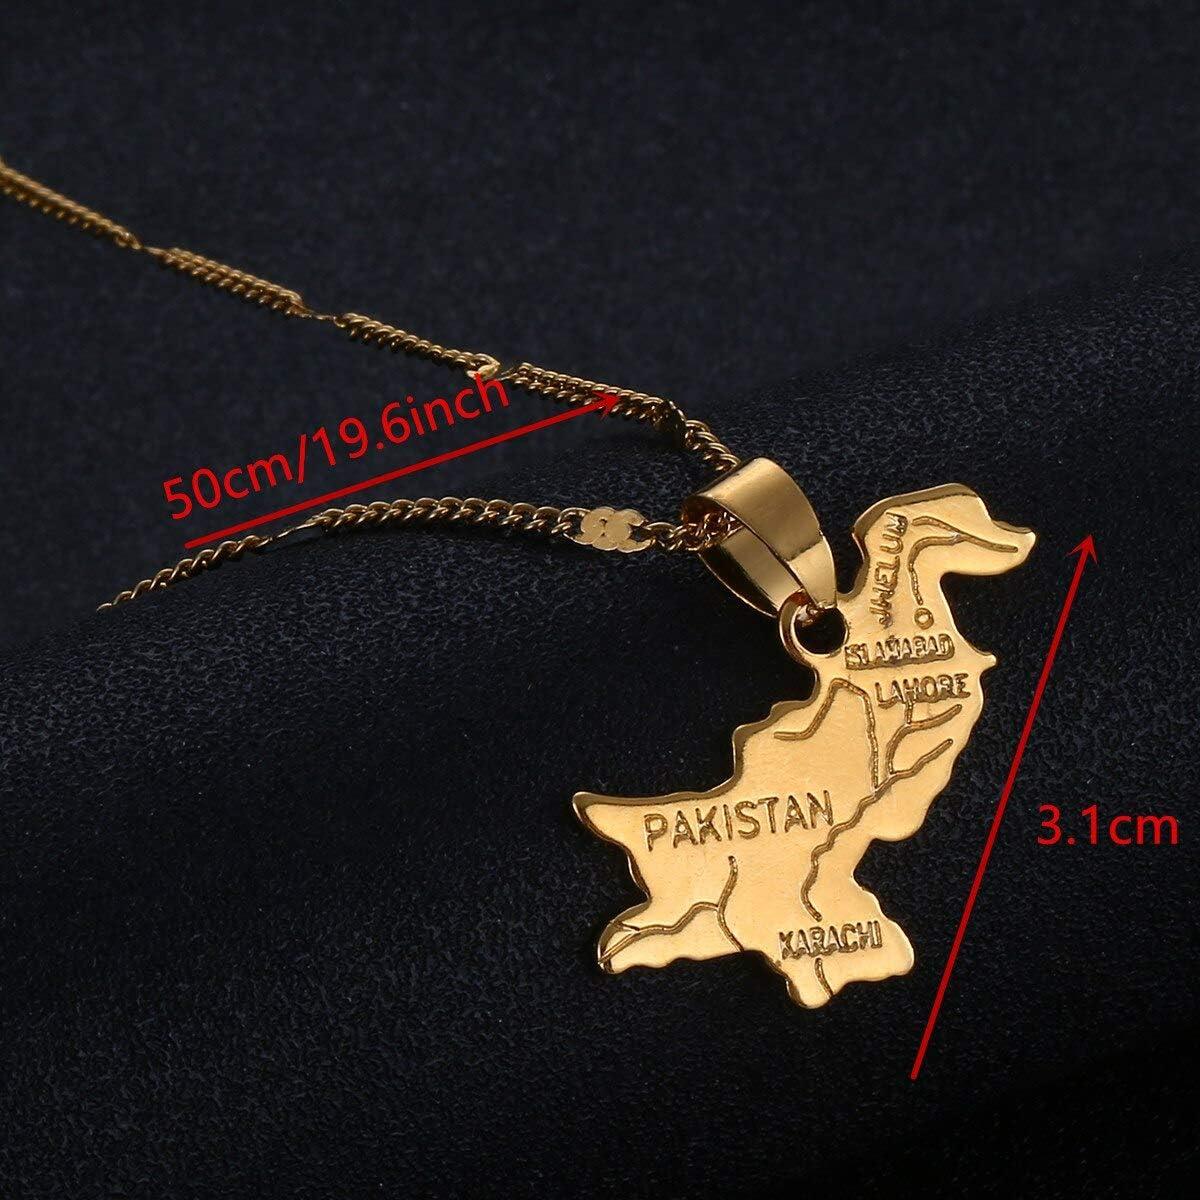 Pakistan Map Pendant Necklace Gold Color Pakistanis Charm Map Jewelry